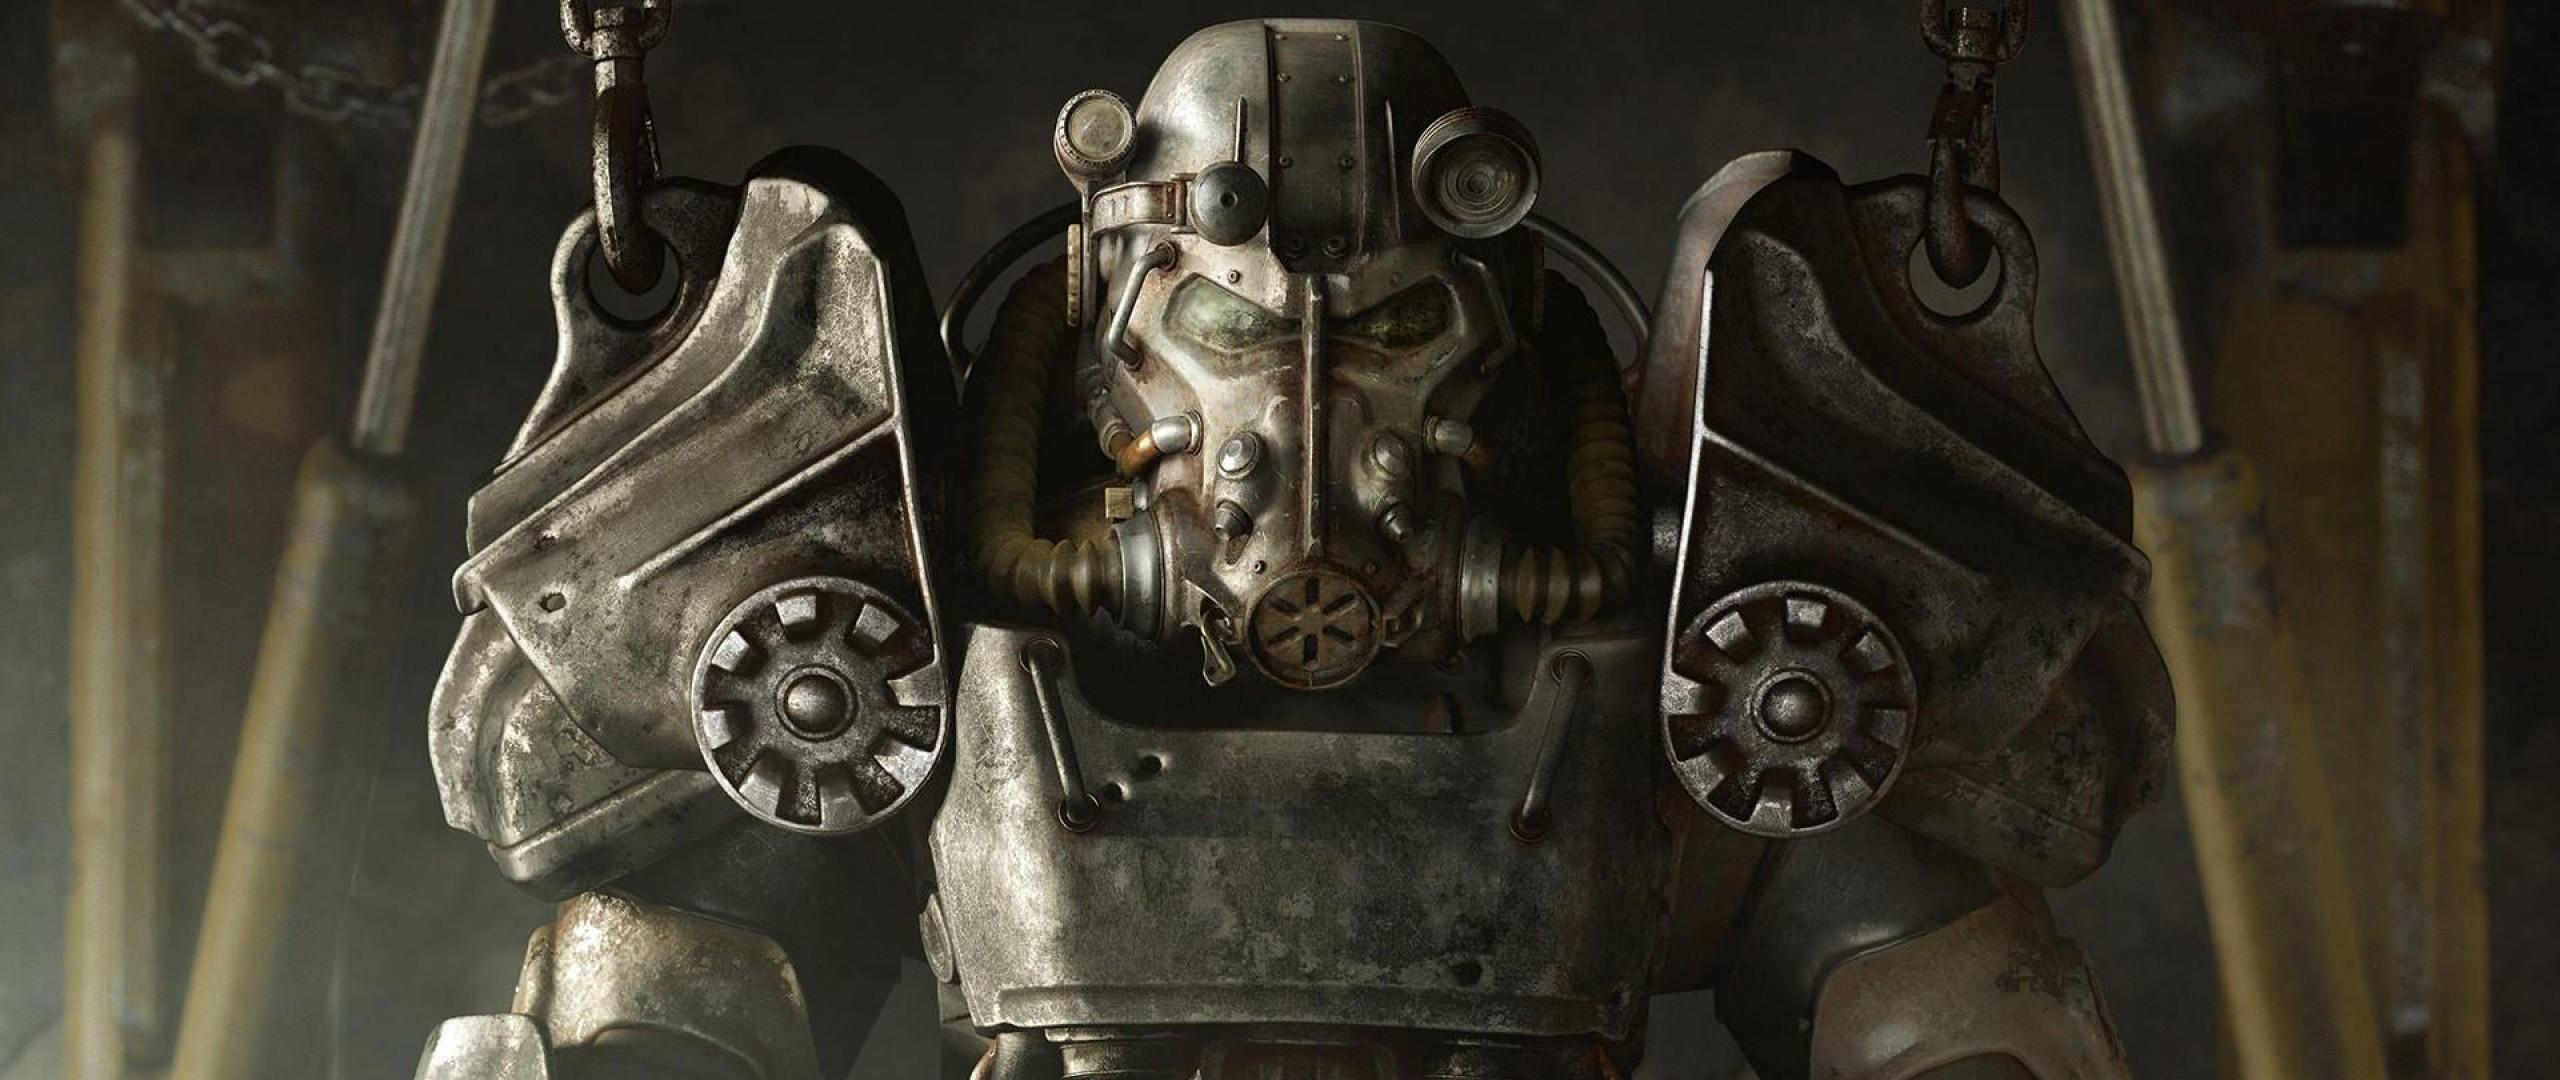 Wallpaper fallout 4, bethesda game studios, bethesda softworks